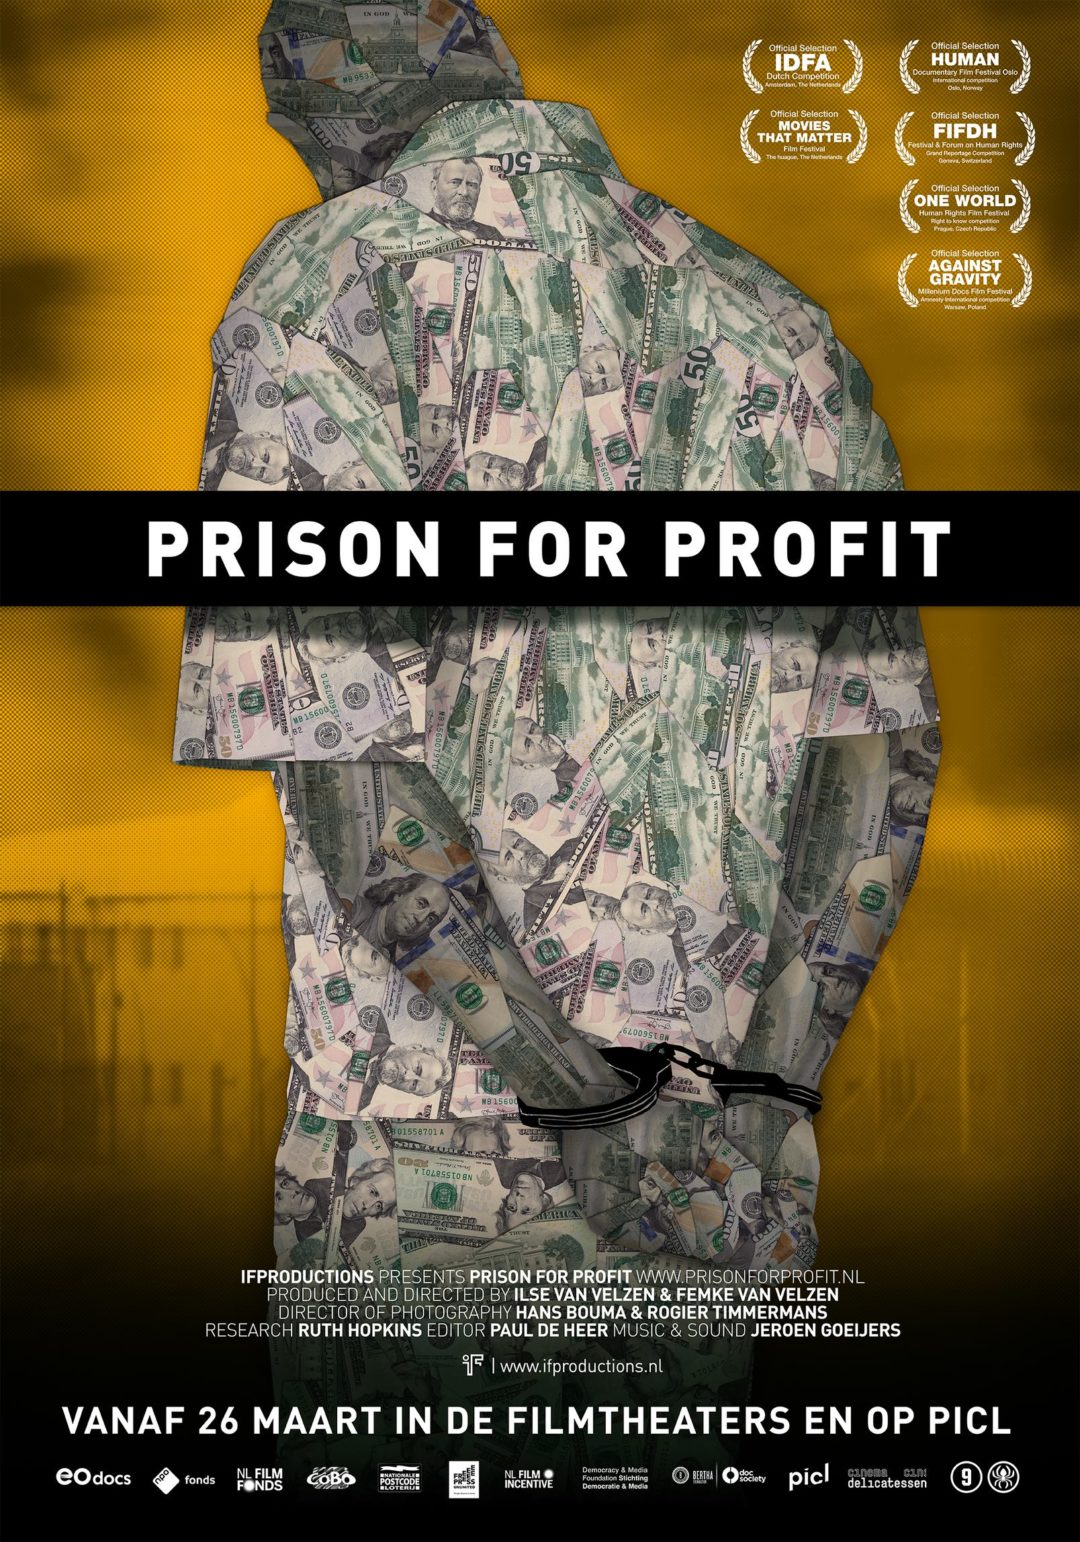 Prison-for-Profit_ps_1_jpg_sd-high.jpg